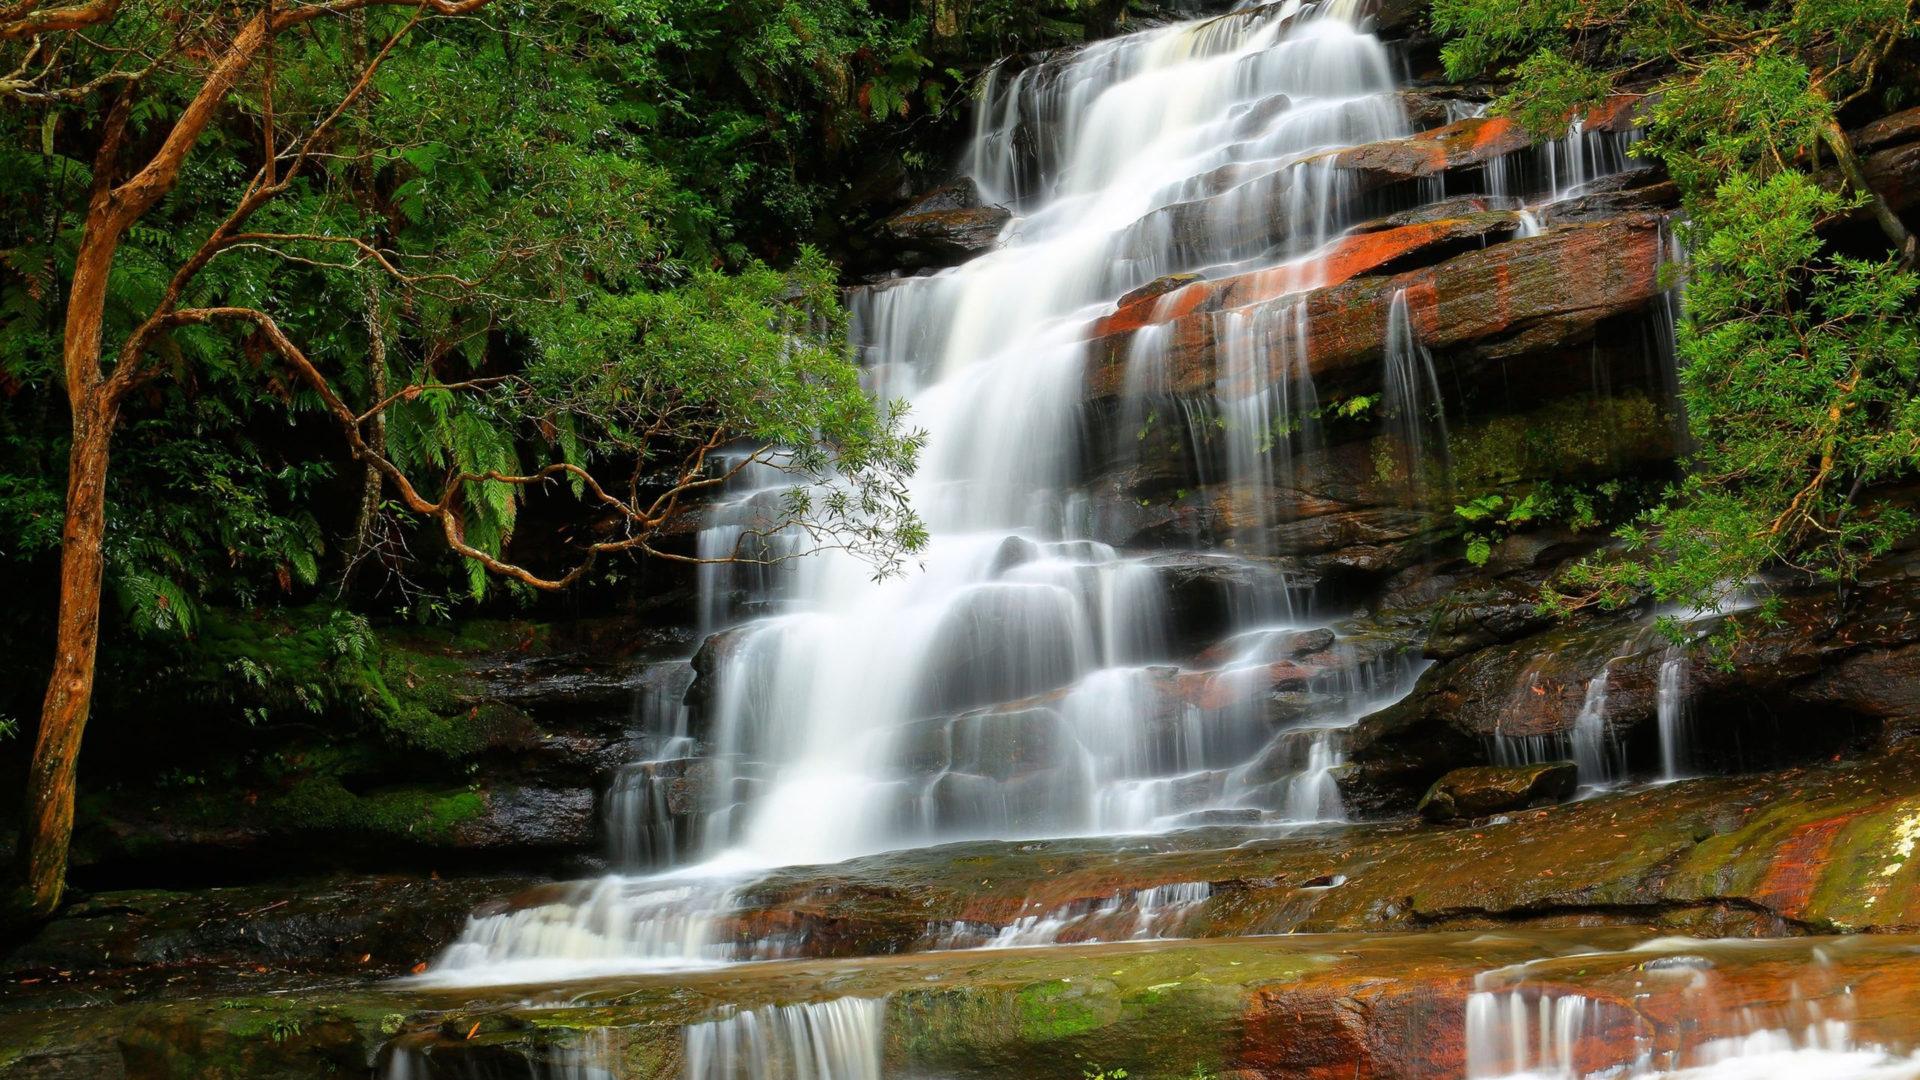 Iguazul Falls Wallpaper Somersby Falls Brisbane Water National Park New South